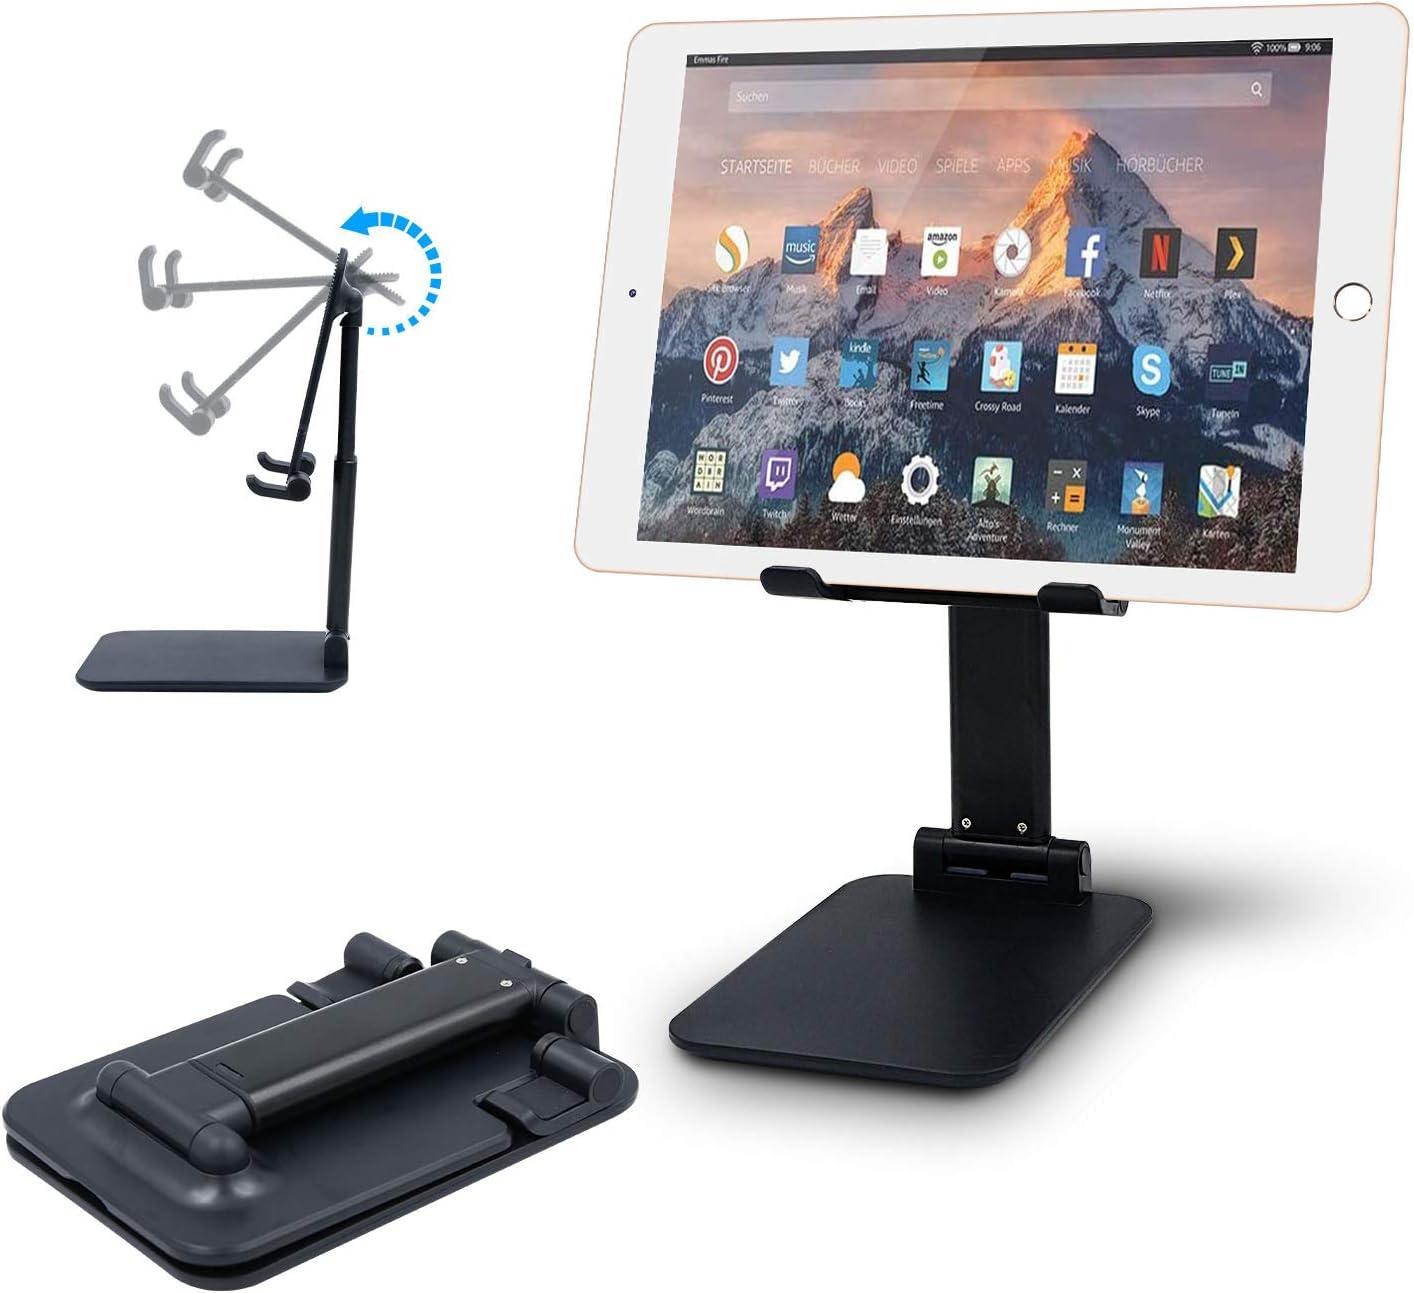 Adjustable Tablet Stand Holder, Foldable Desktop Stand Cradle Dock Holder,Multi-Angle Height Adjustable Tablet Holder for iPad Microsoft Surface Tablets, Samsung Galaxy Tabs and All Tablets (Black)